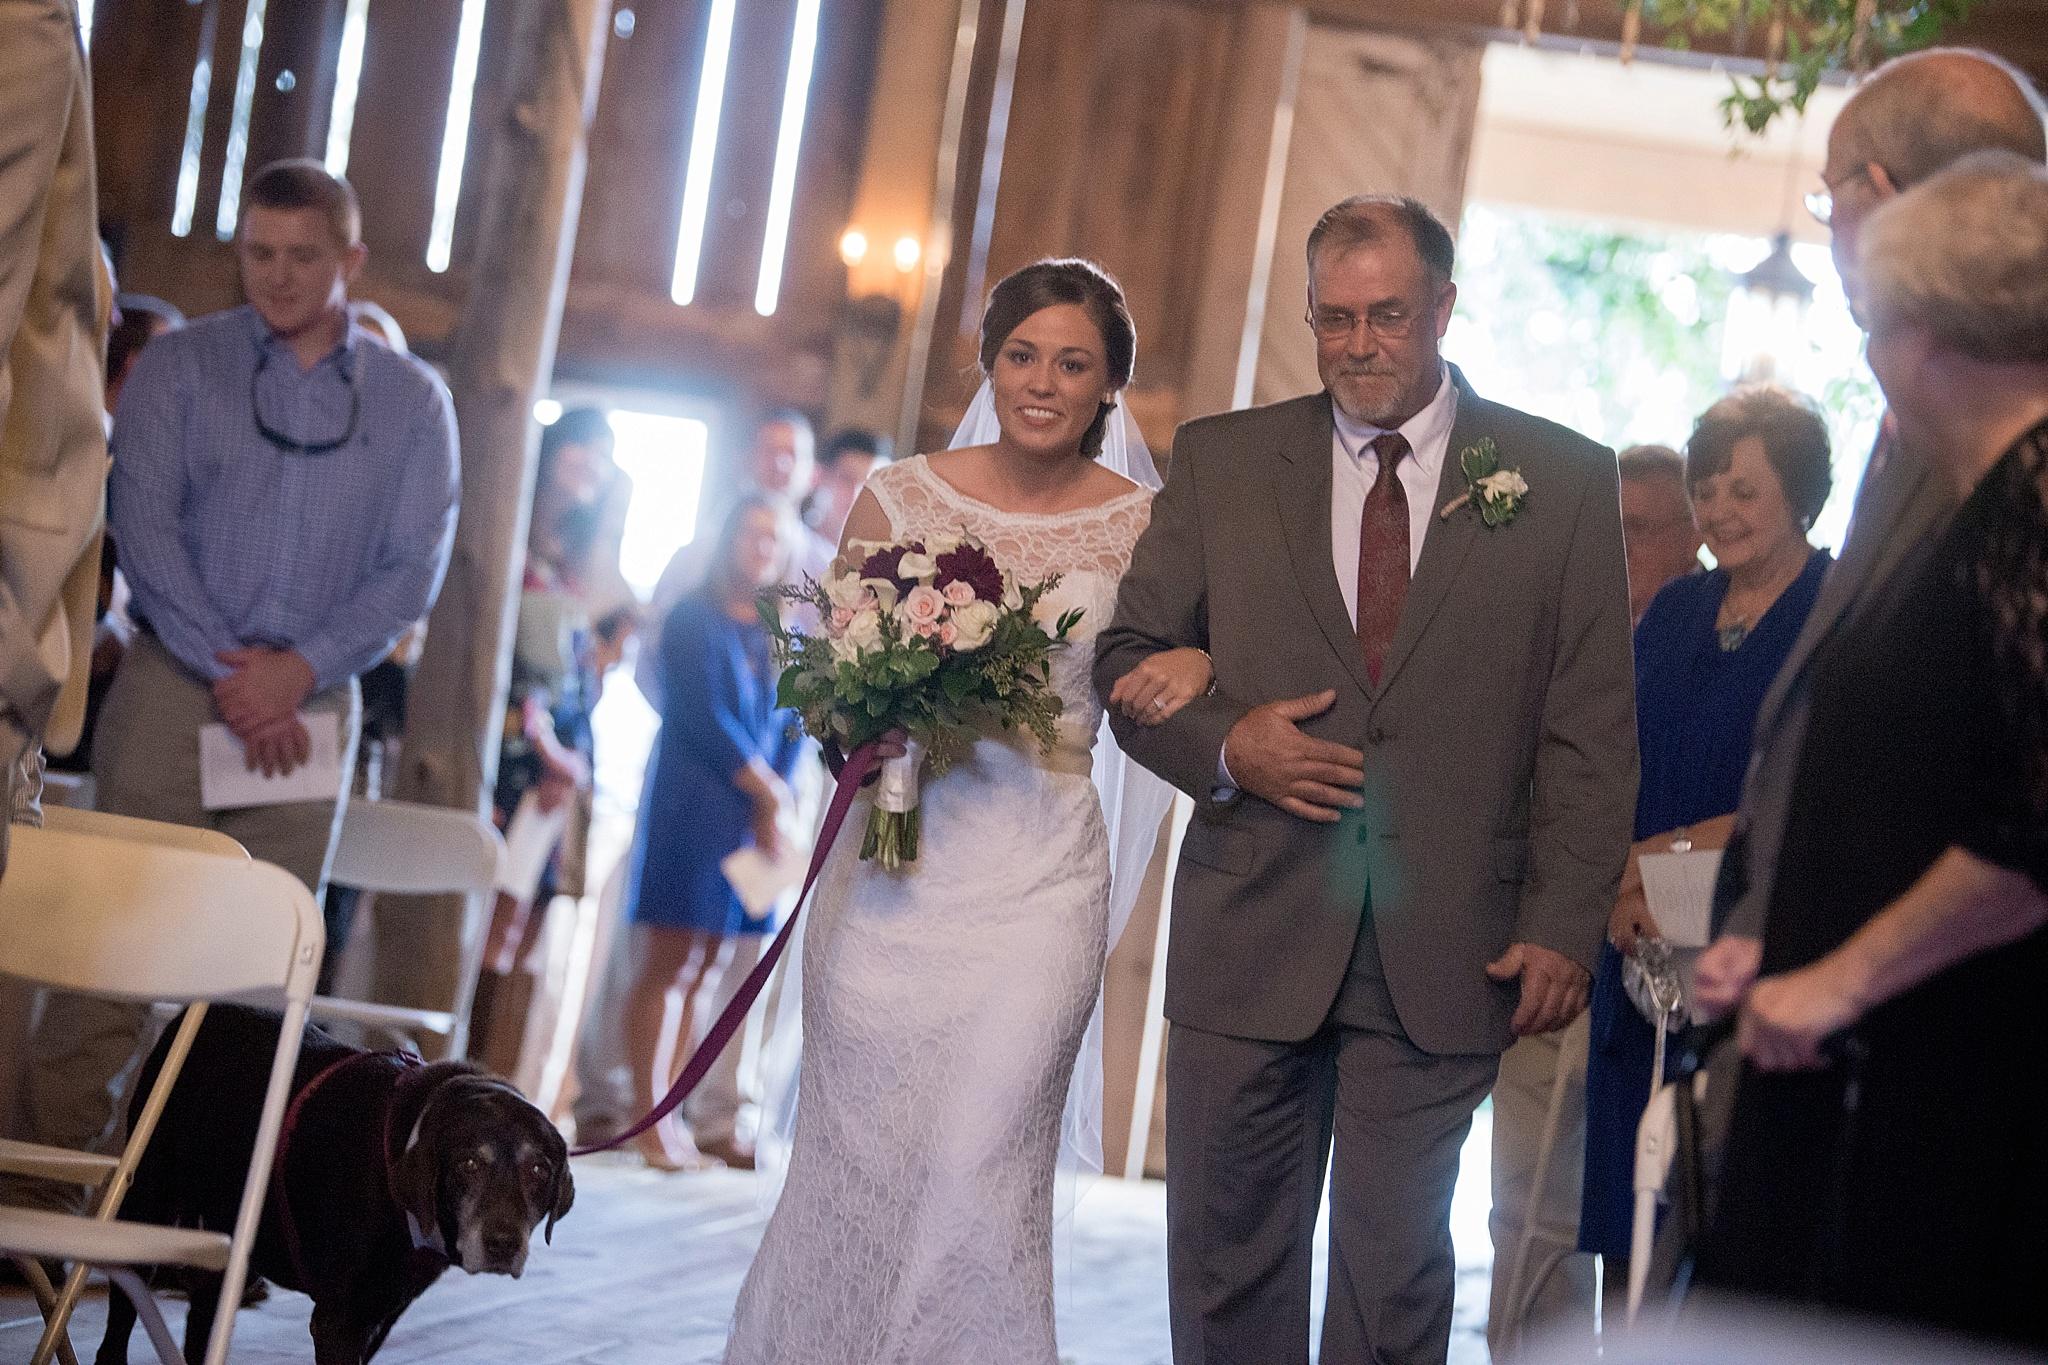 May-Lew-Farm-Farmville-NC-Wedding-Photographer-088.jpg